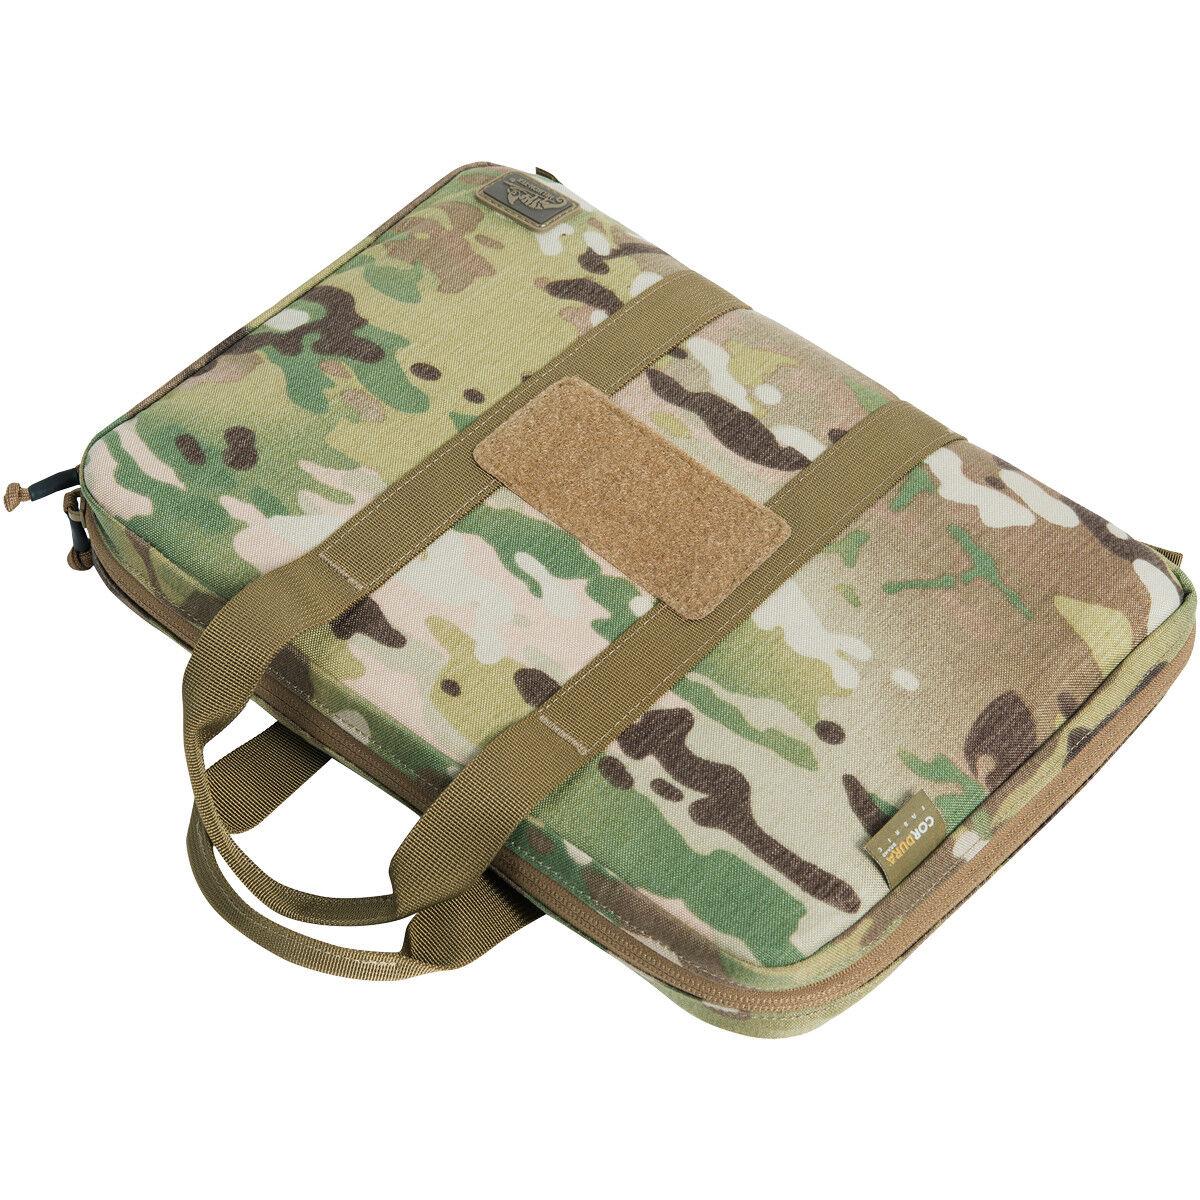 Helikon Double Pistol Wallet Ammo Gun Carrier Storage Pouch Case Bag MultiCam